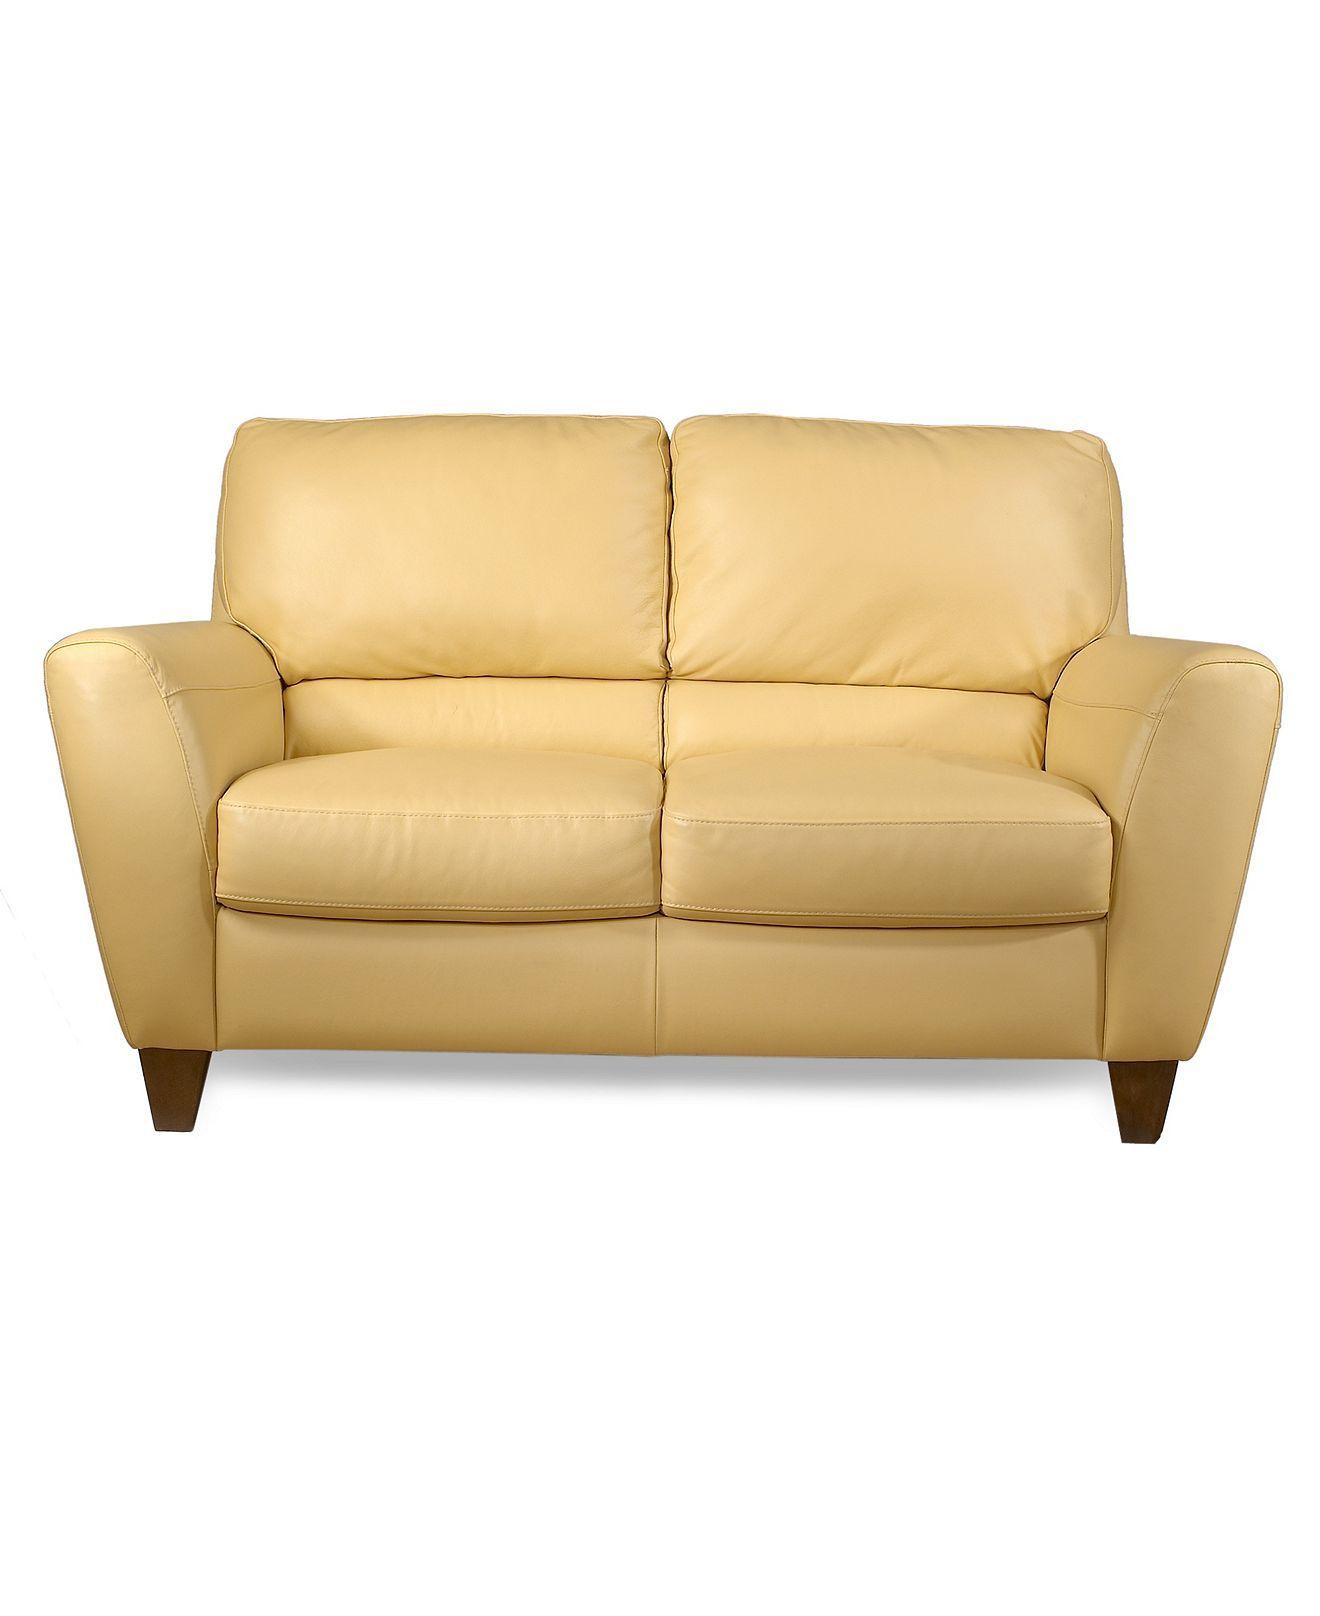 Enjoyable Almafi Leather Loveseat 63W X 38D X 36H Furniture Creativecarmelina Interior Chair Design Creativecarmelinacom